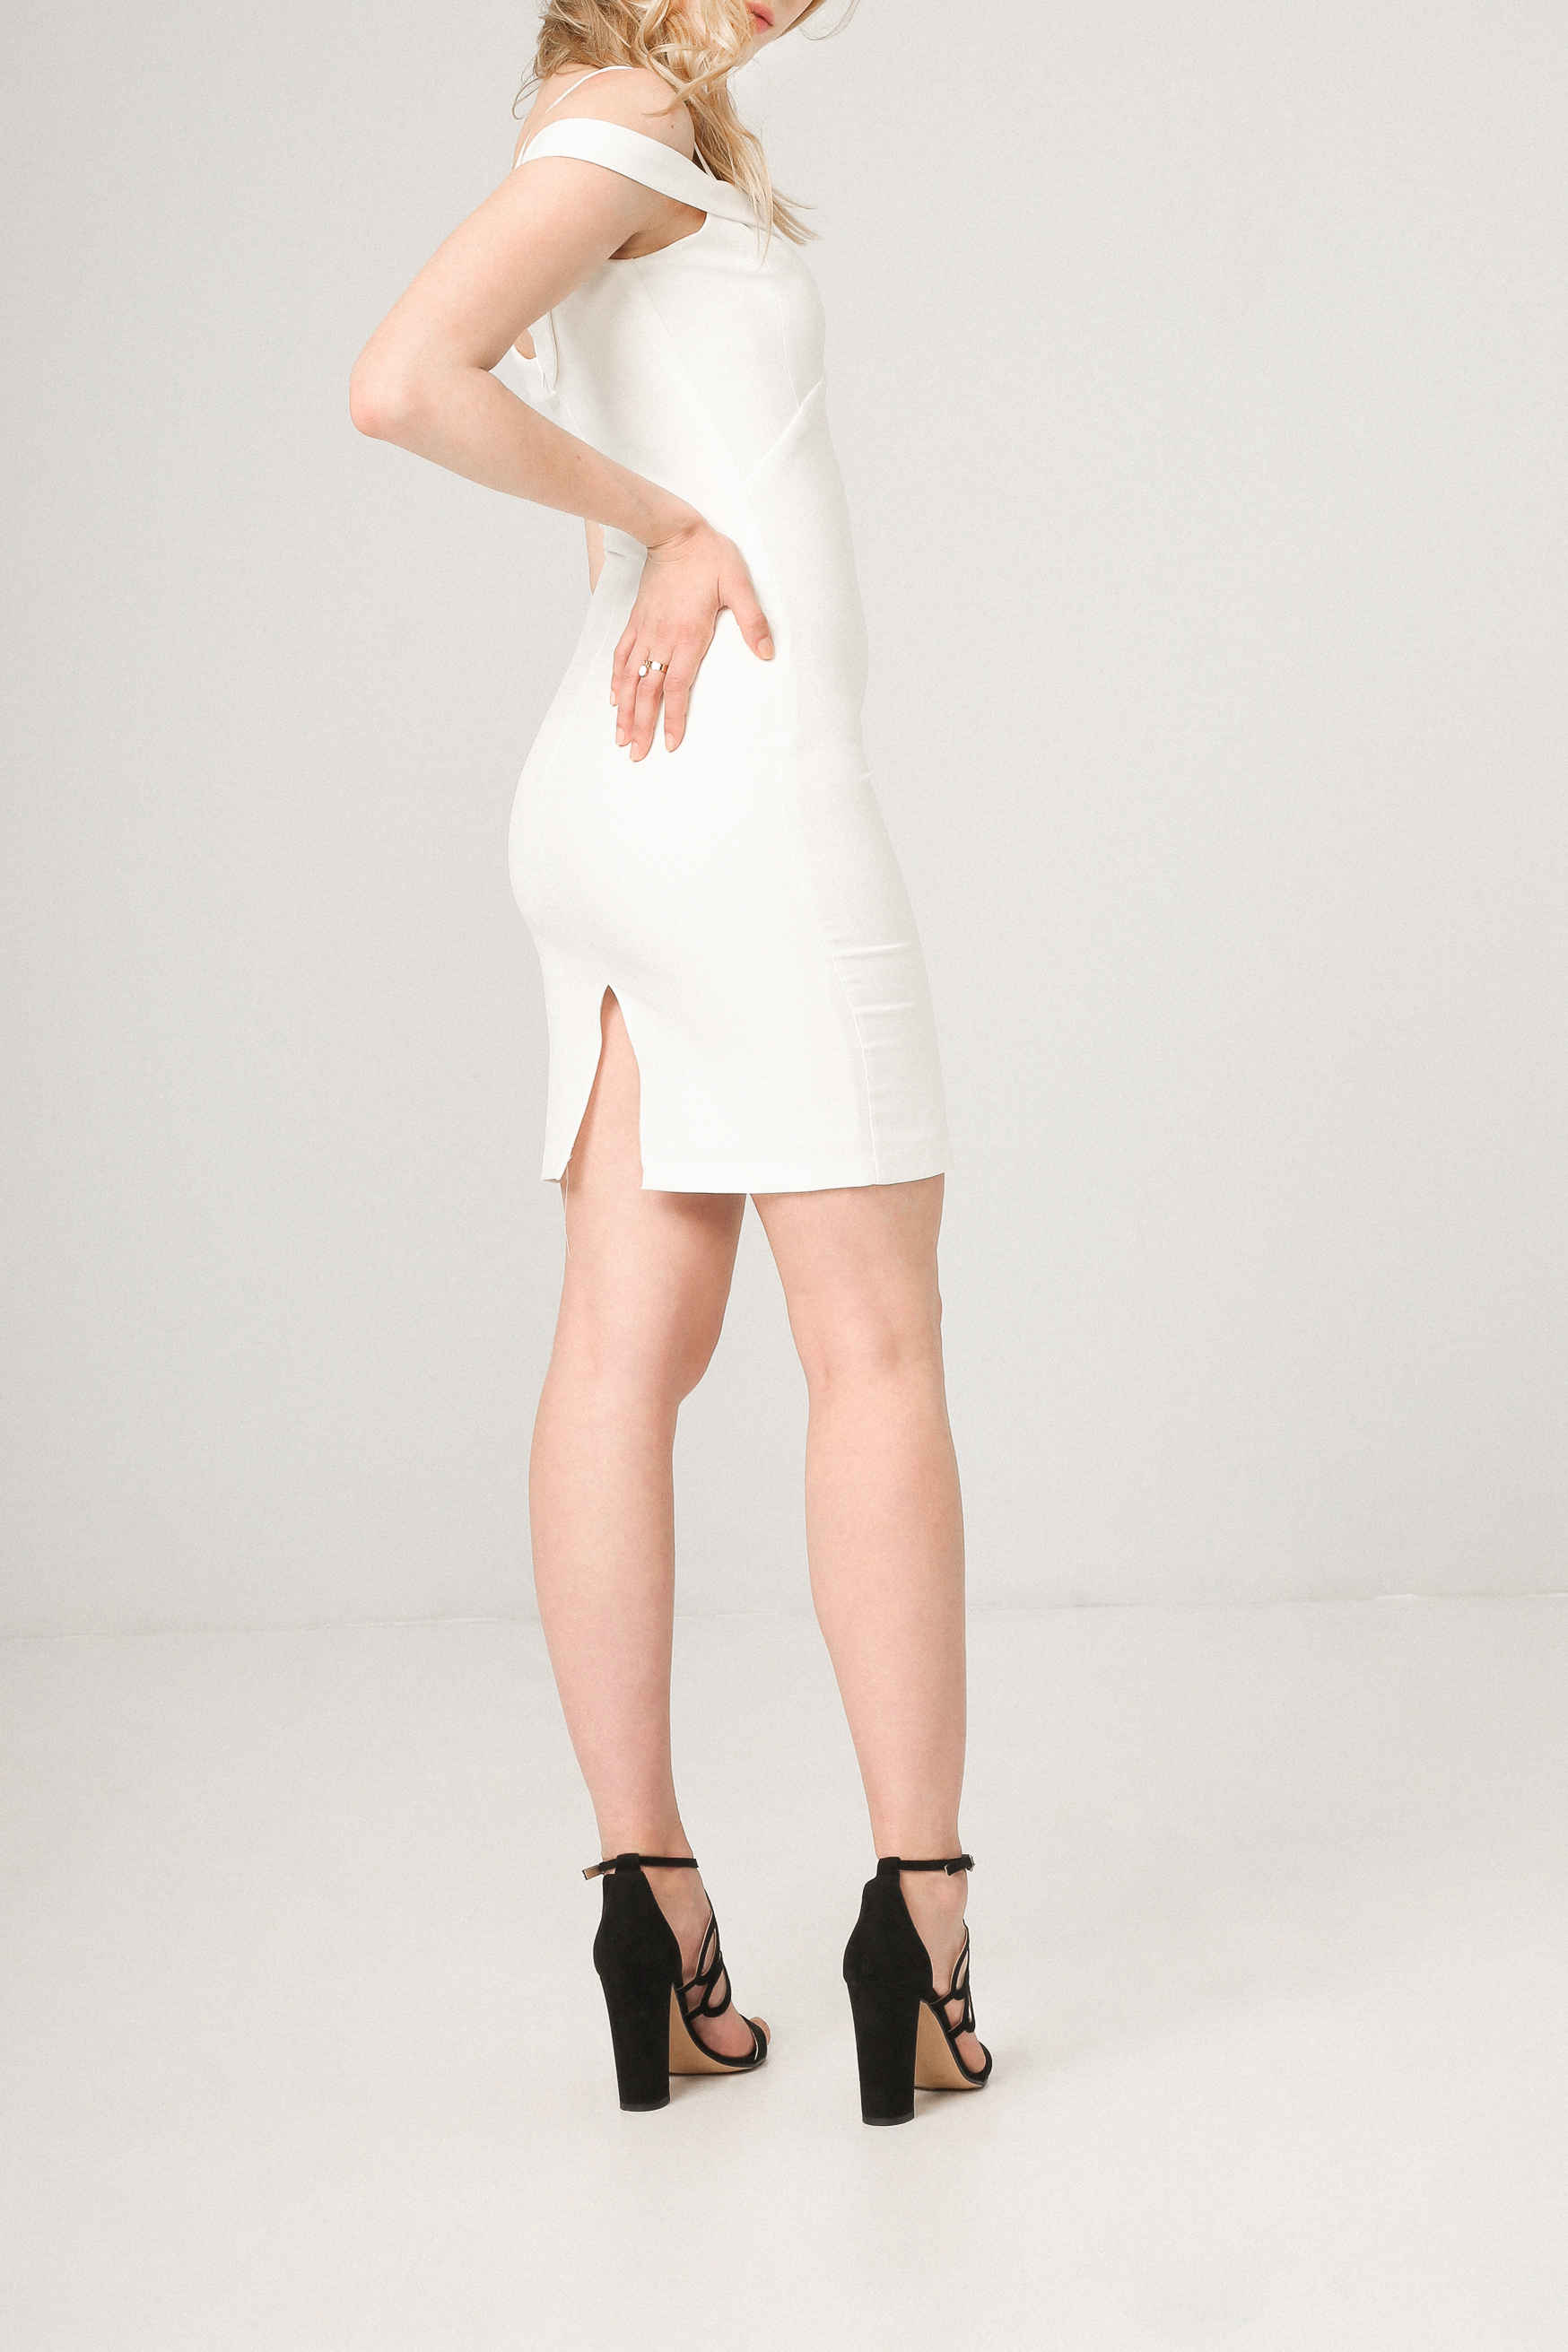 Robes  Fontana 2.0 MIRTA white